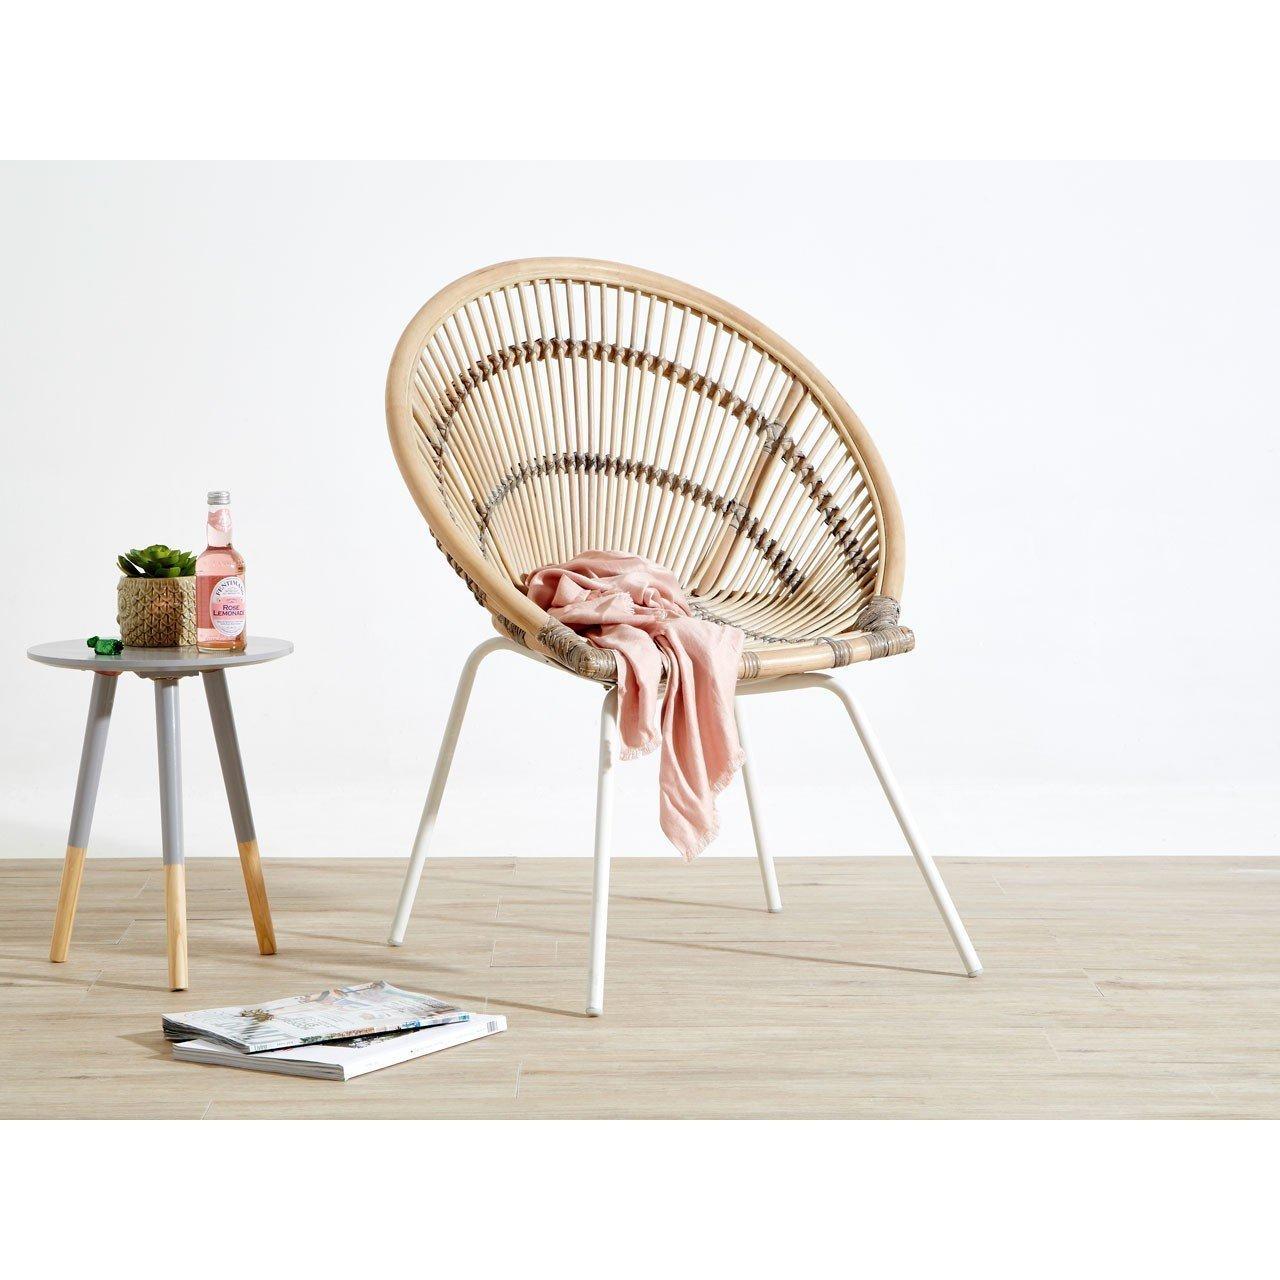 Mid Century Bohemian Wicker Cane Egg Chair 1950 S Mid Century Design White Metal Legs Vinterior